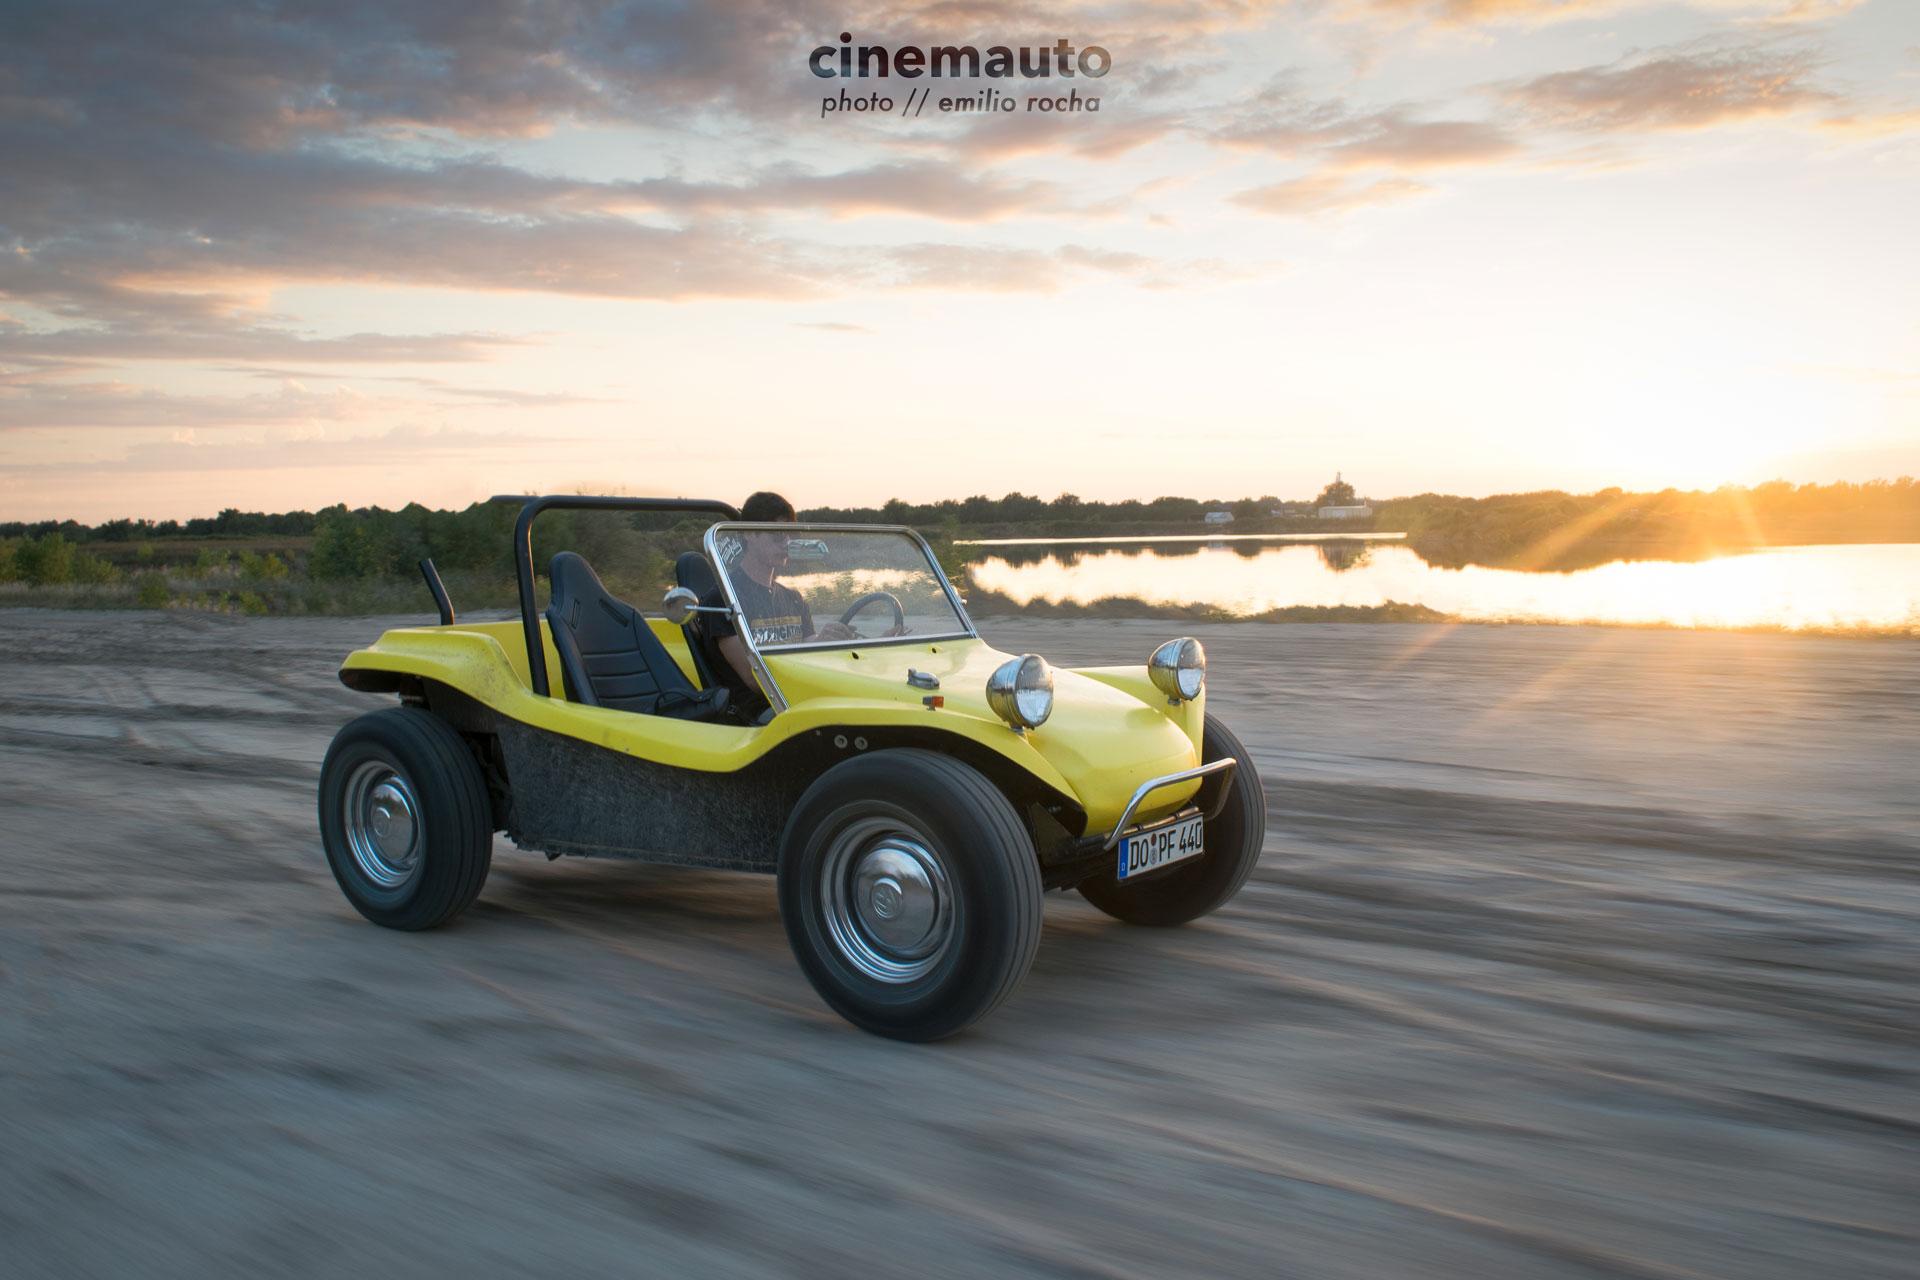 wichita-automotive-photography-cinemauto-gv2.jpg